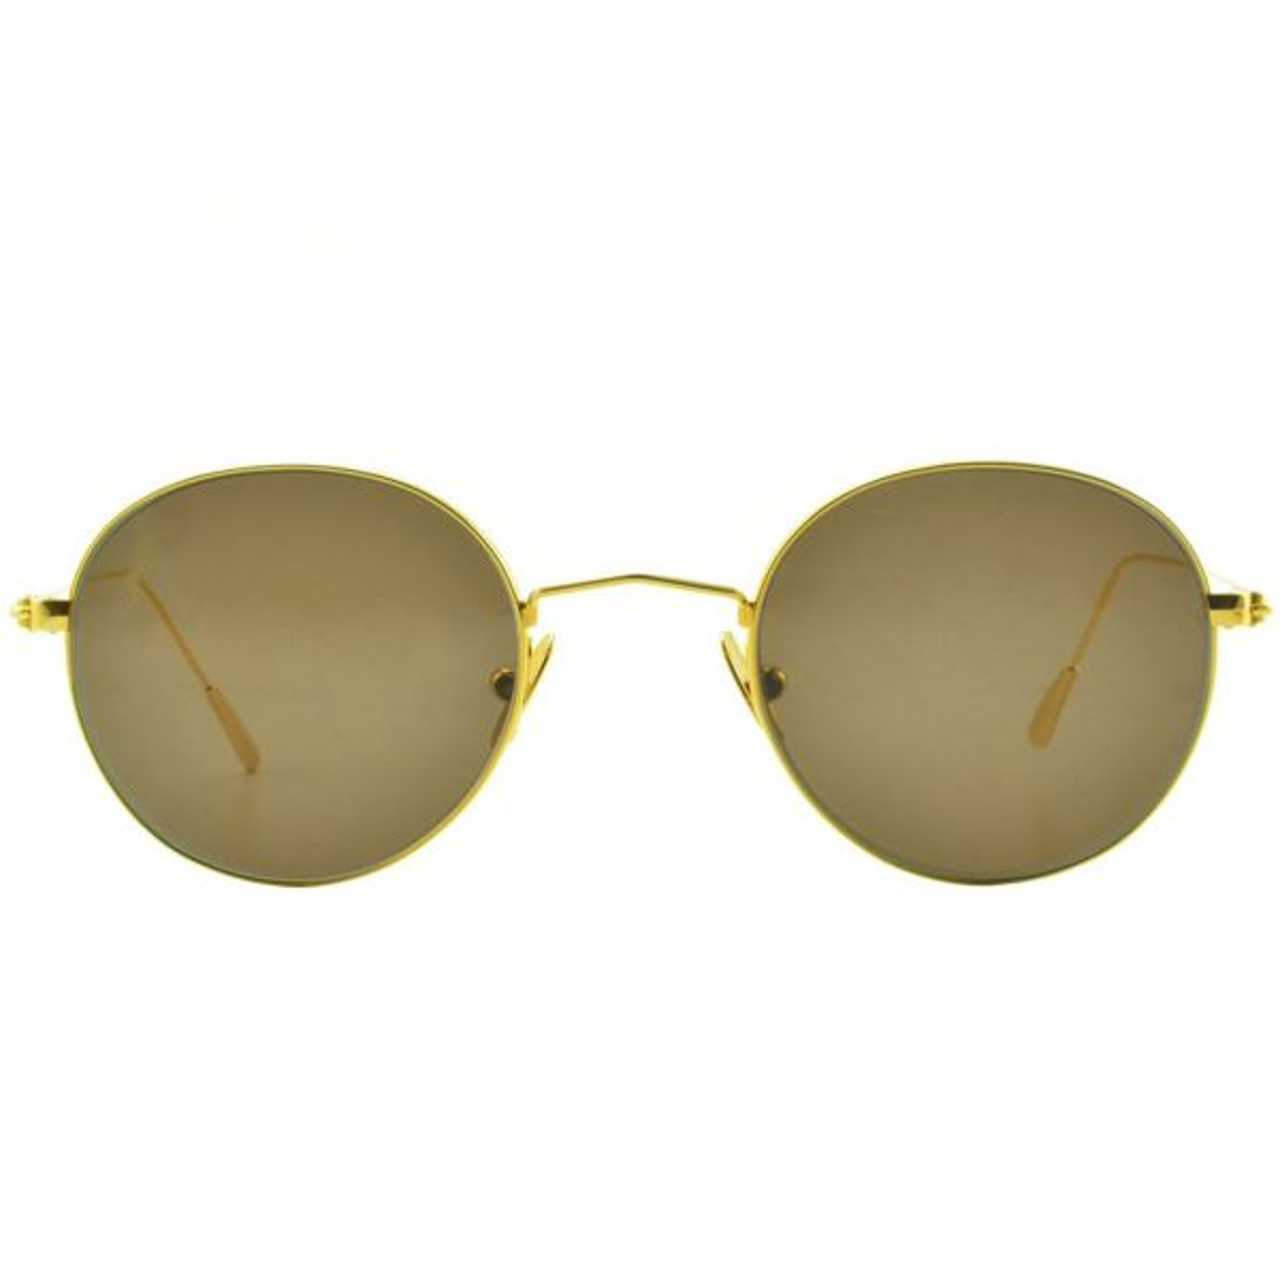 عینک آفتابی Nik03 سری Gold مدل Nk1103 Rgp